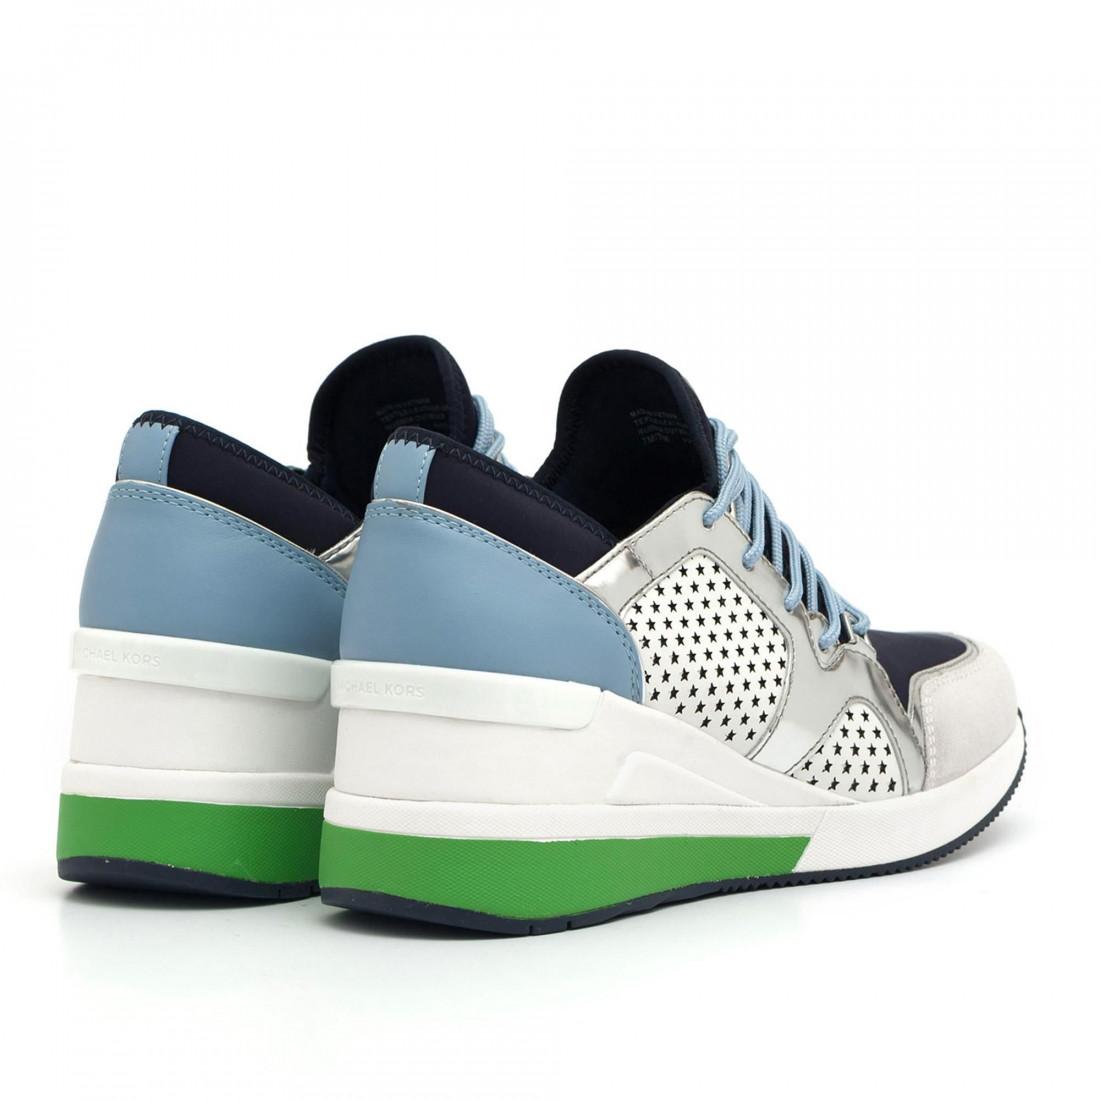 sneakers donna michael kors 43r8scfs6d341 2666